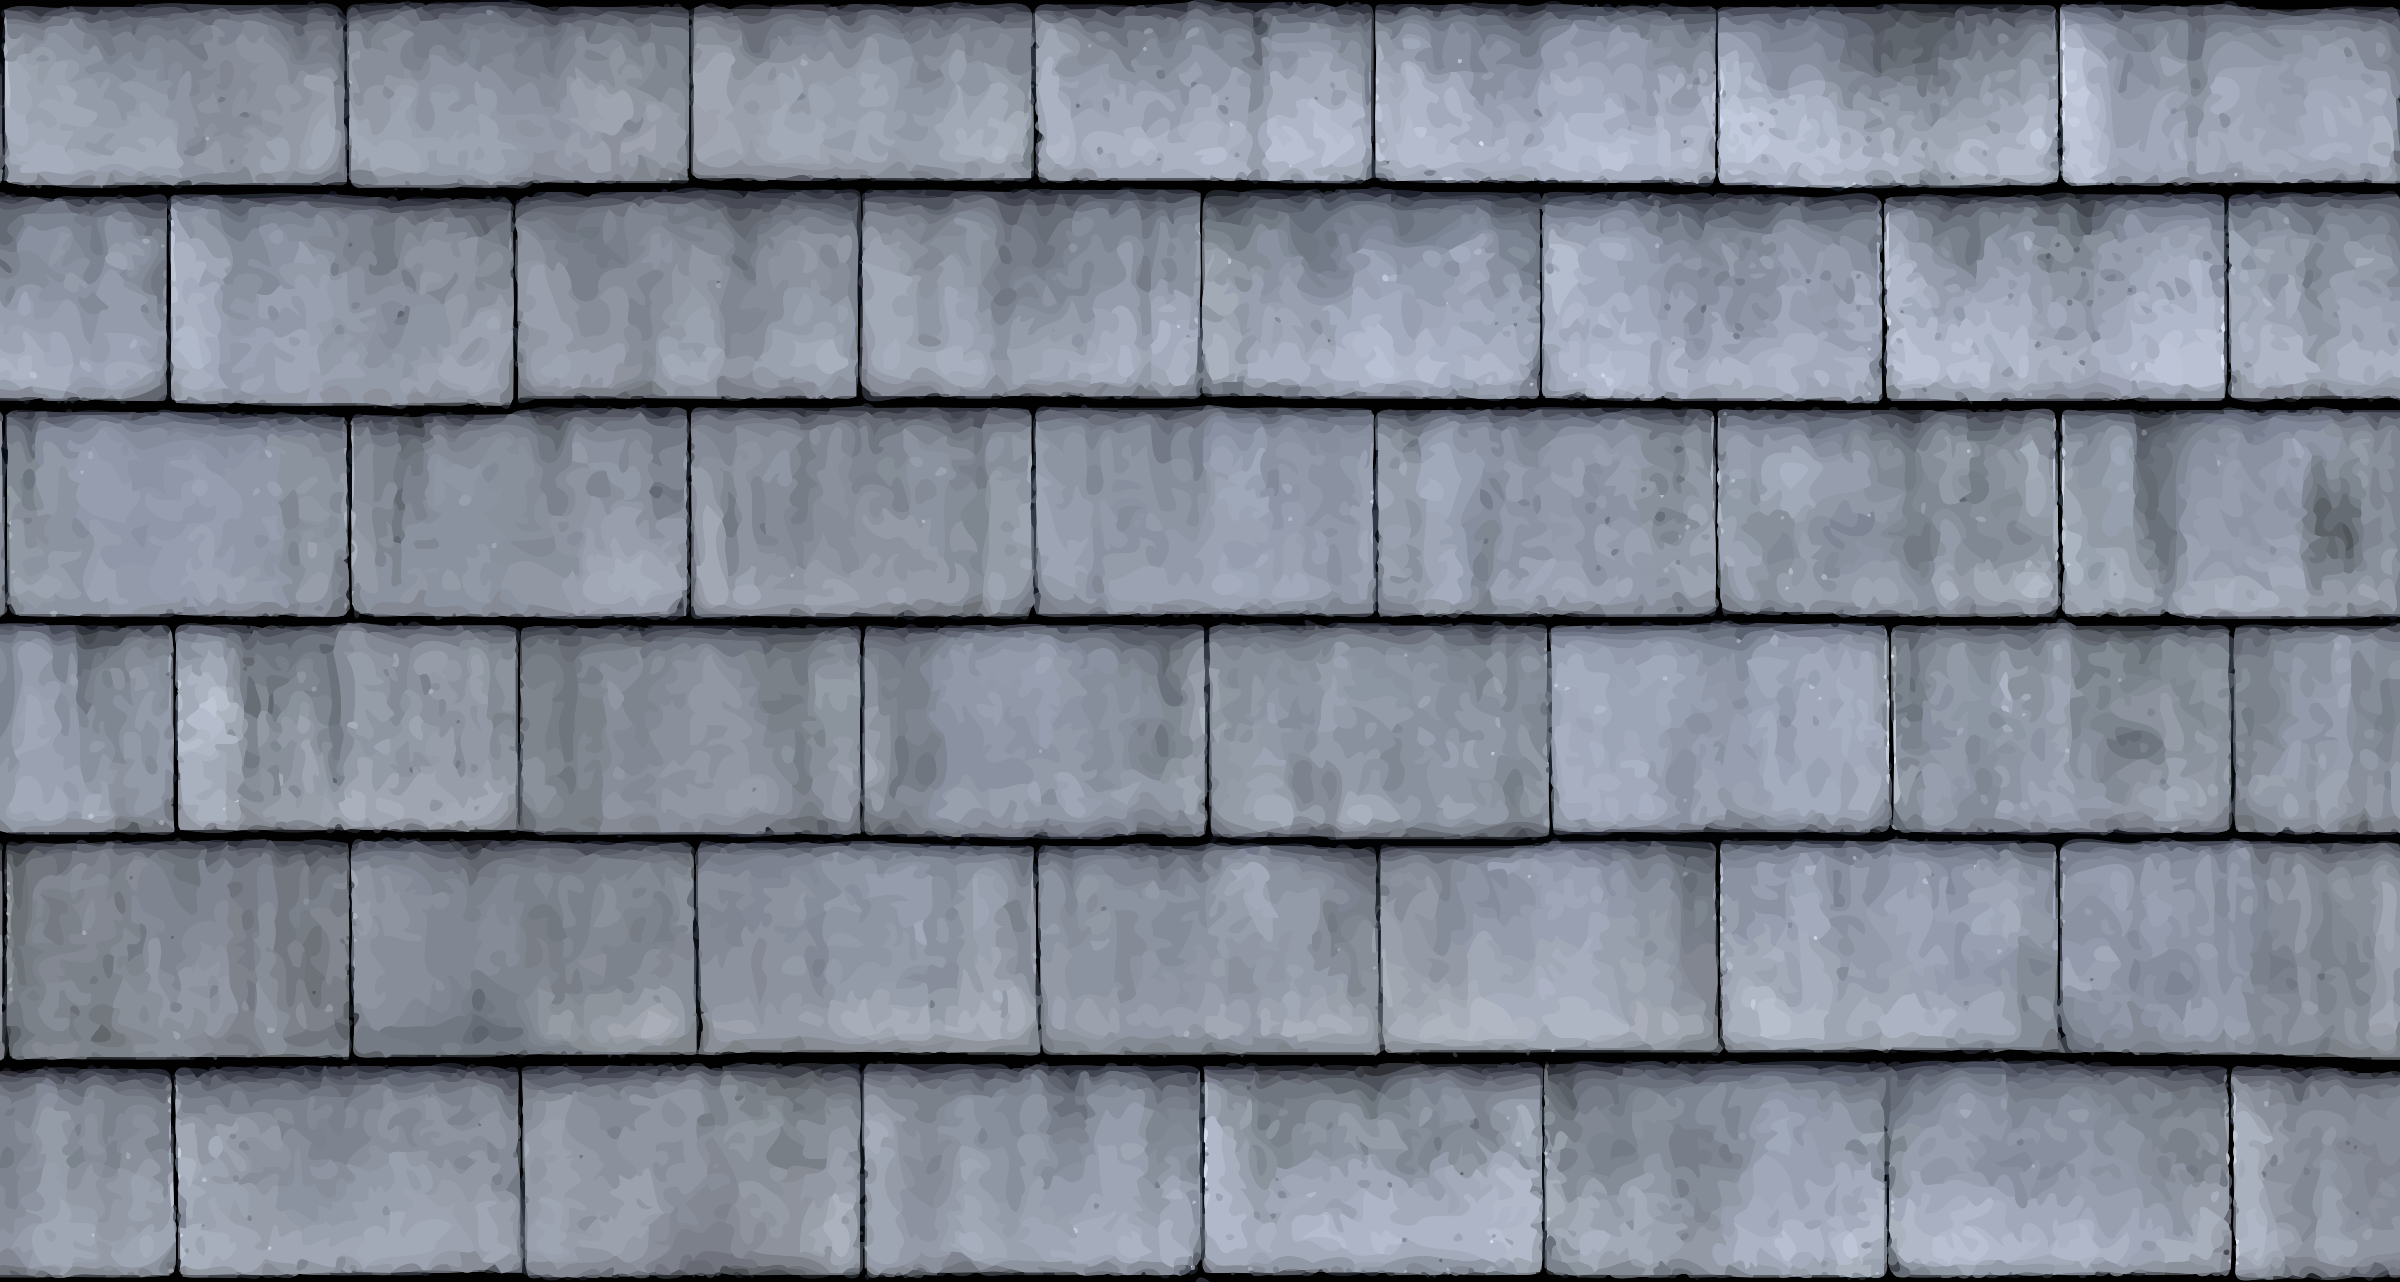 Clipart slate roof tiles 3 for Roof tile patterns